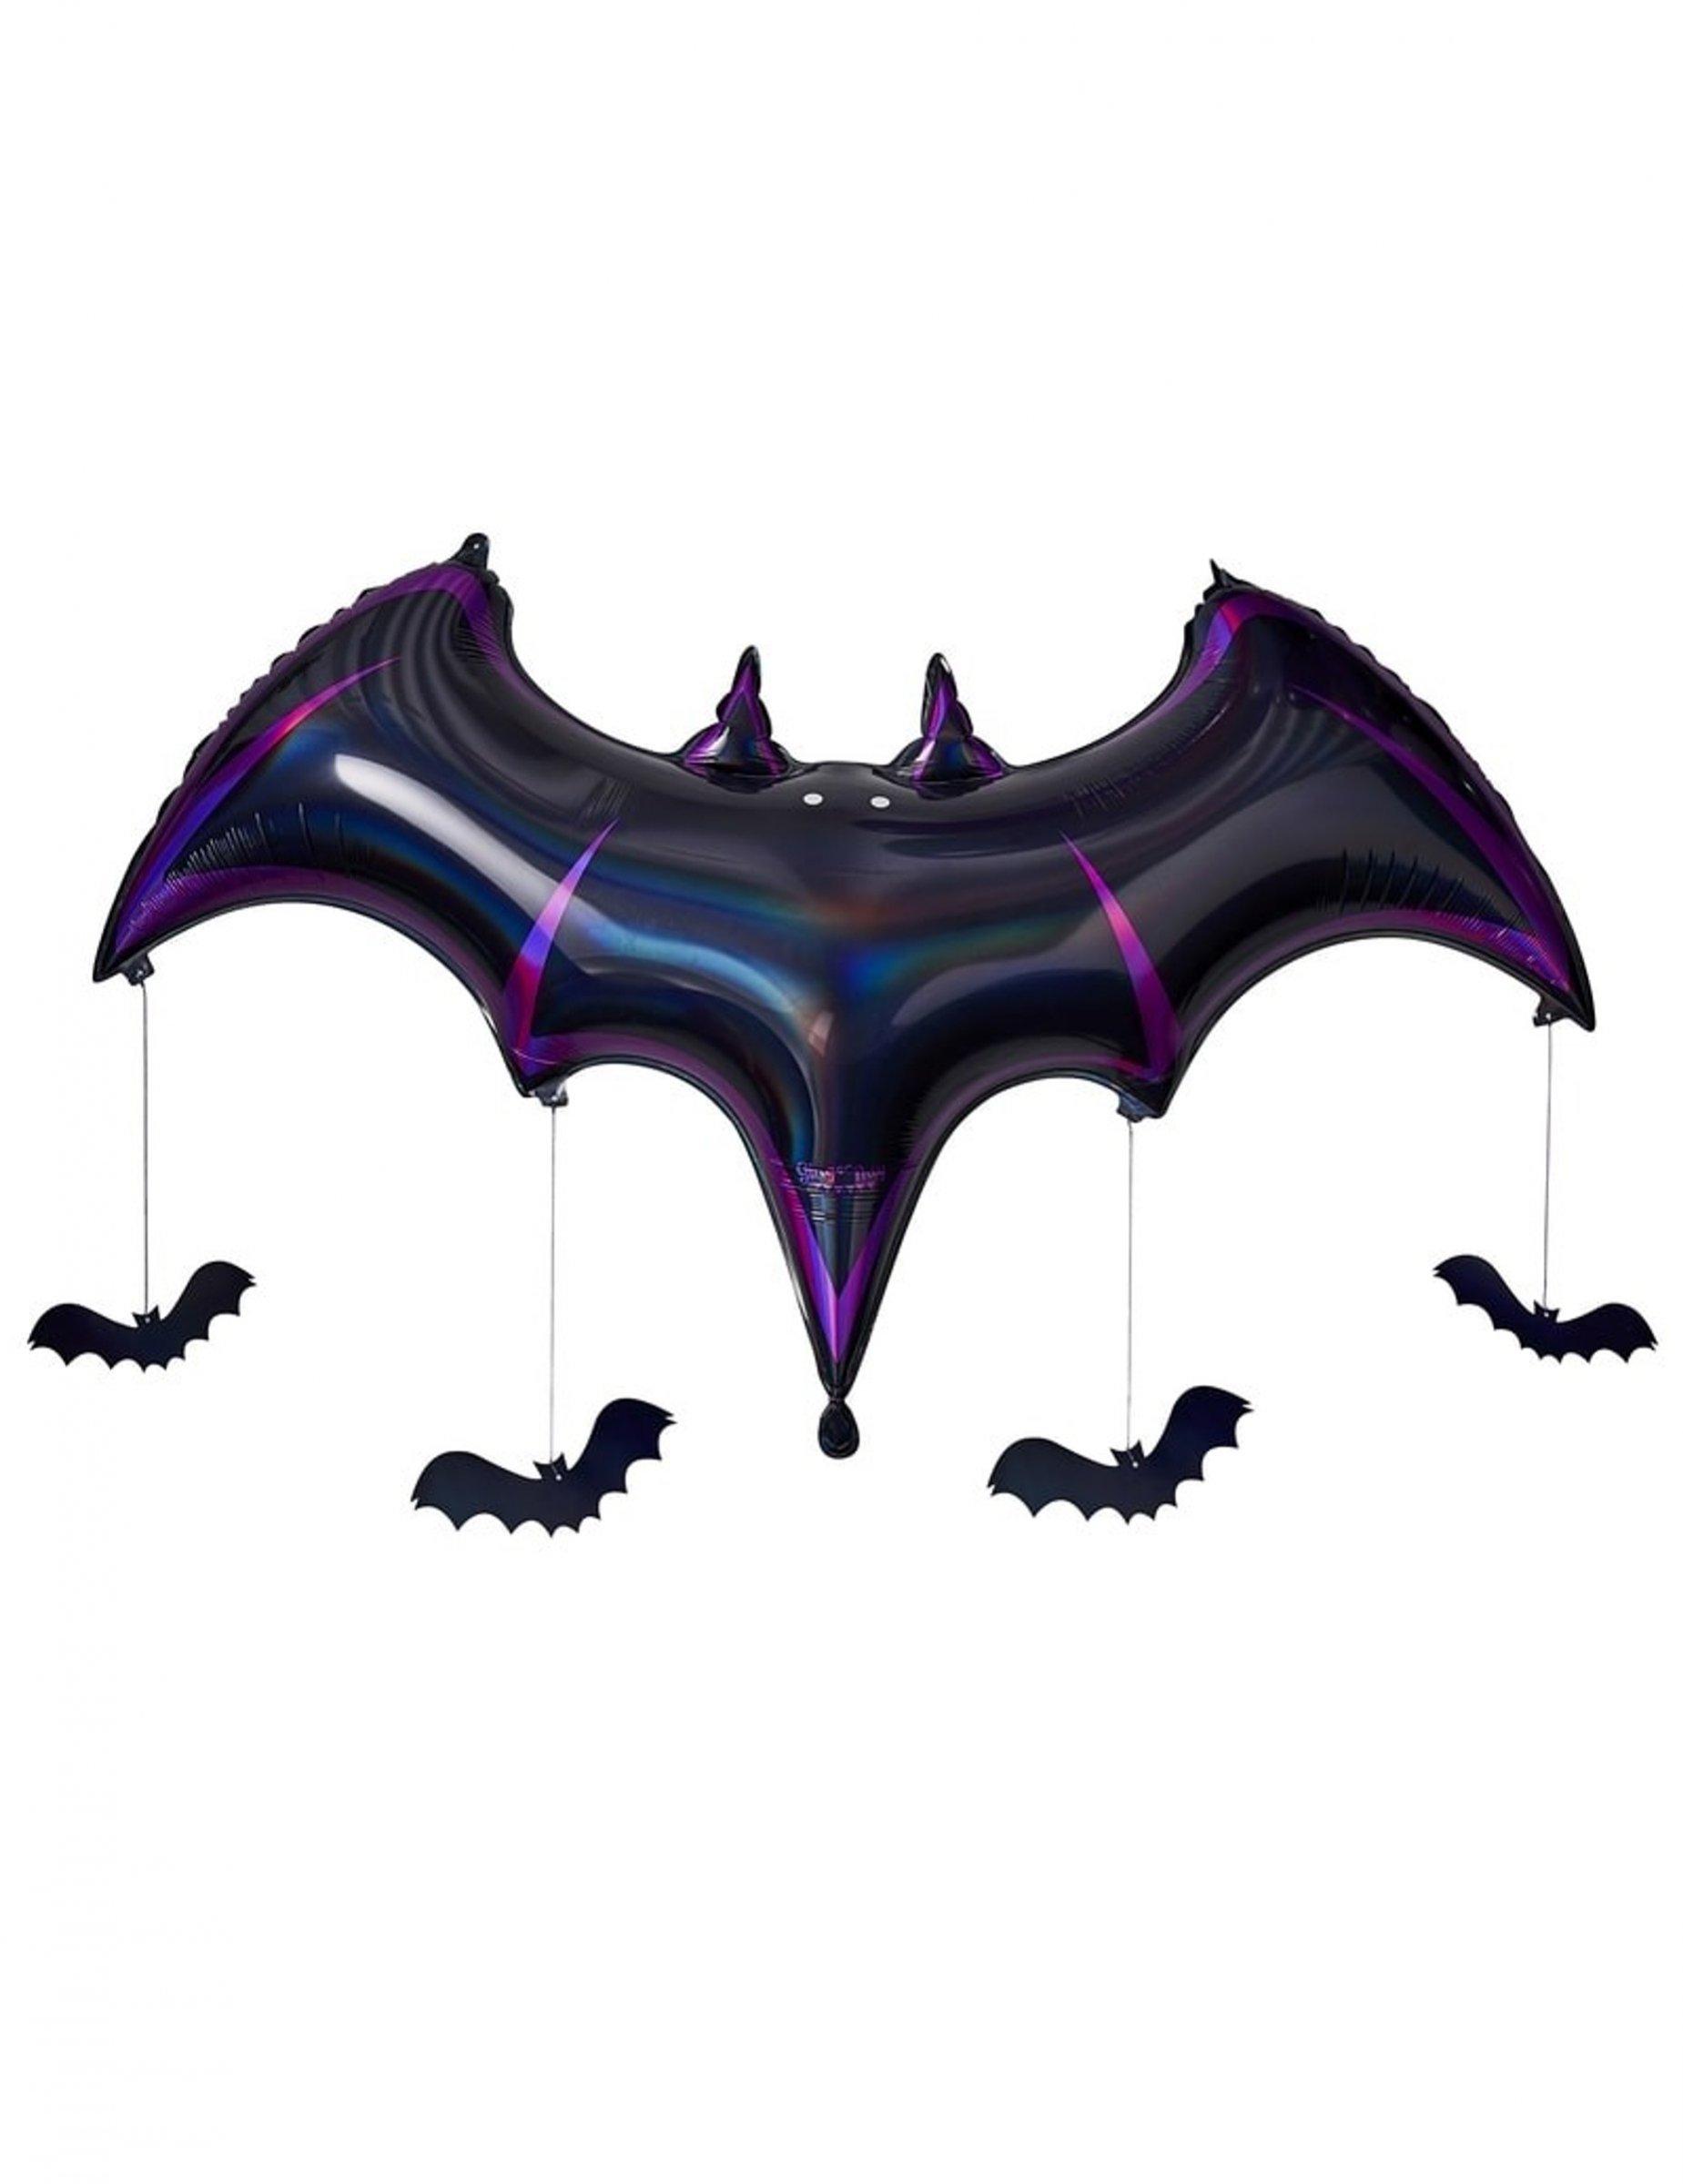 Fledermaus Luftballon Aluminium Ballon Halloween Deko Violett 130x80x20 Cm Gunstige Faschings Partydeko Zubehor Bei Karneval Megastore